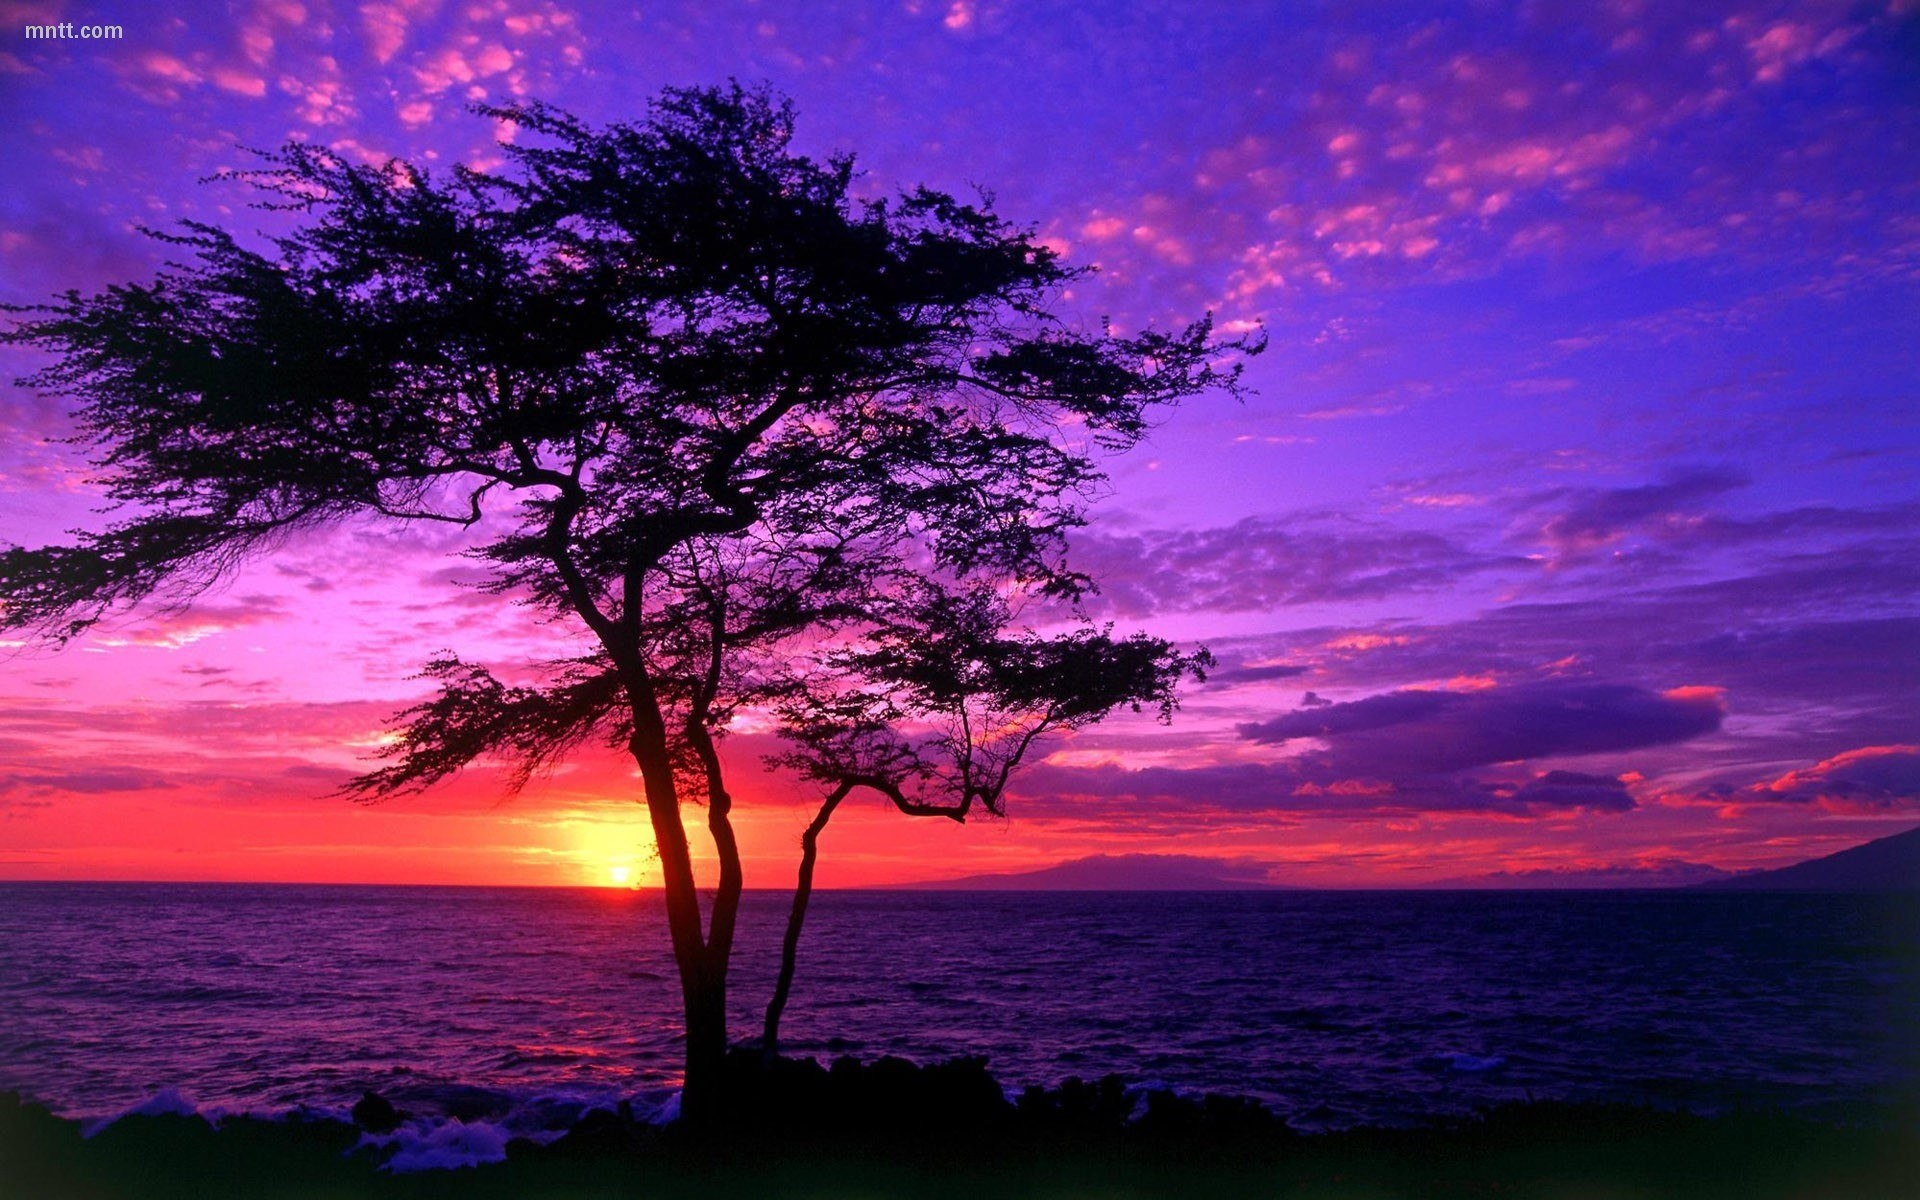 wallpaper-qmhgxry-seaside-beautiful-sunset-sunrise-scenery-pretty-images.jpg  (1920×1200) | Sunrises & Sunsets Photography | Pinterest | Wallpaper and …